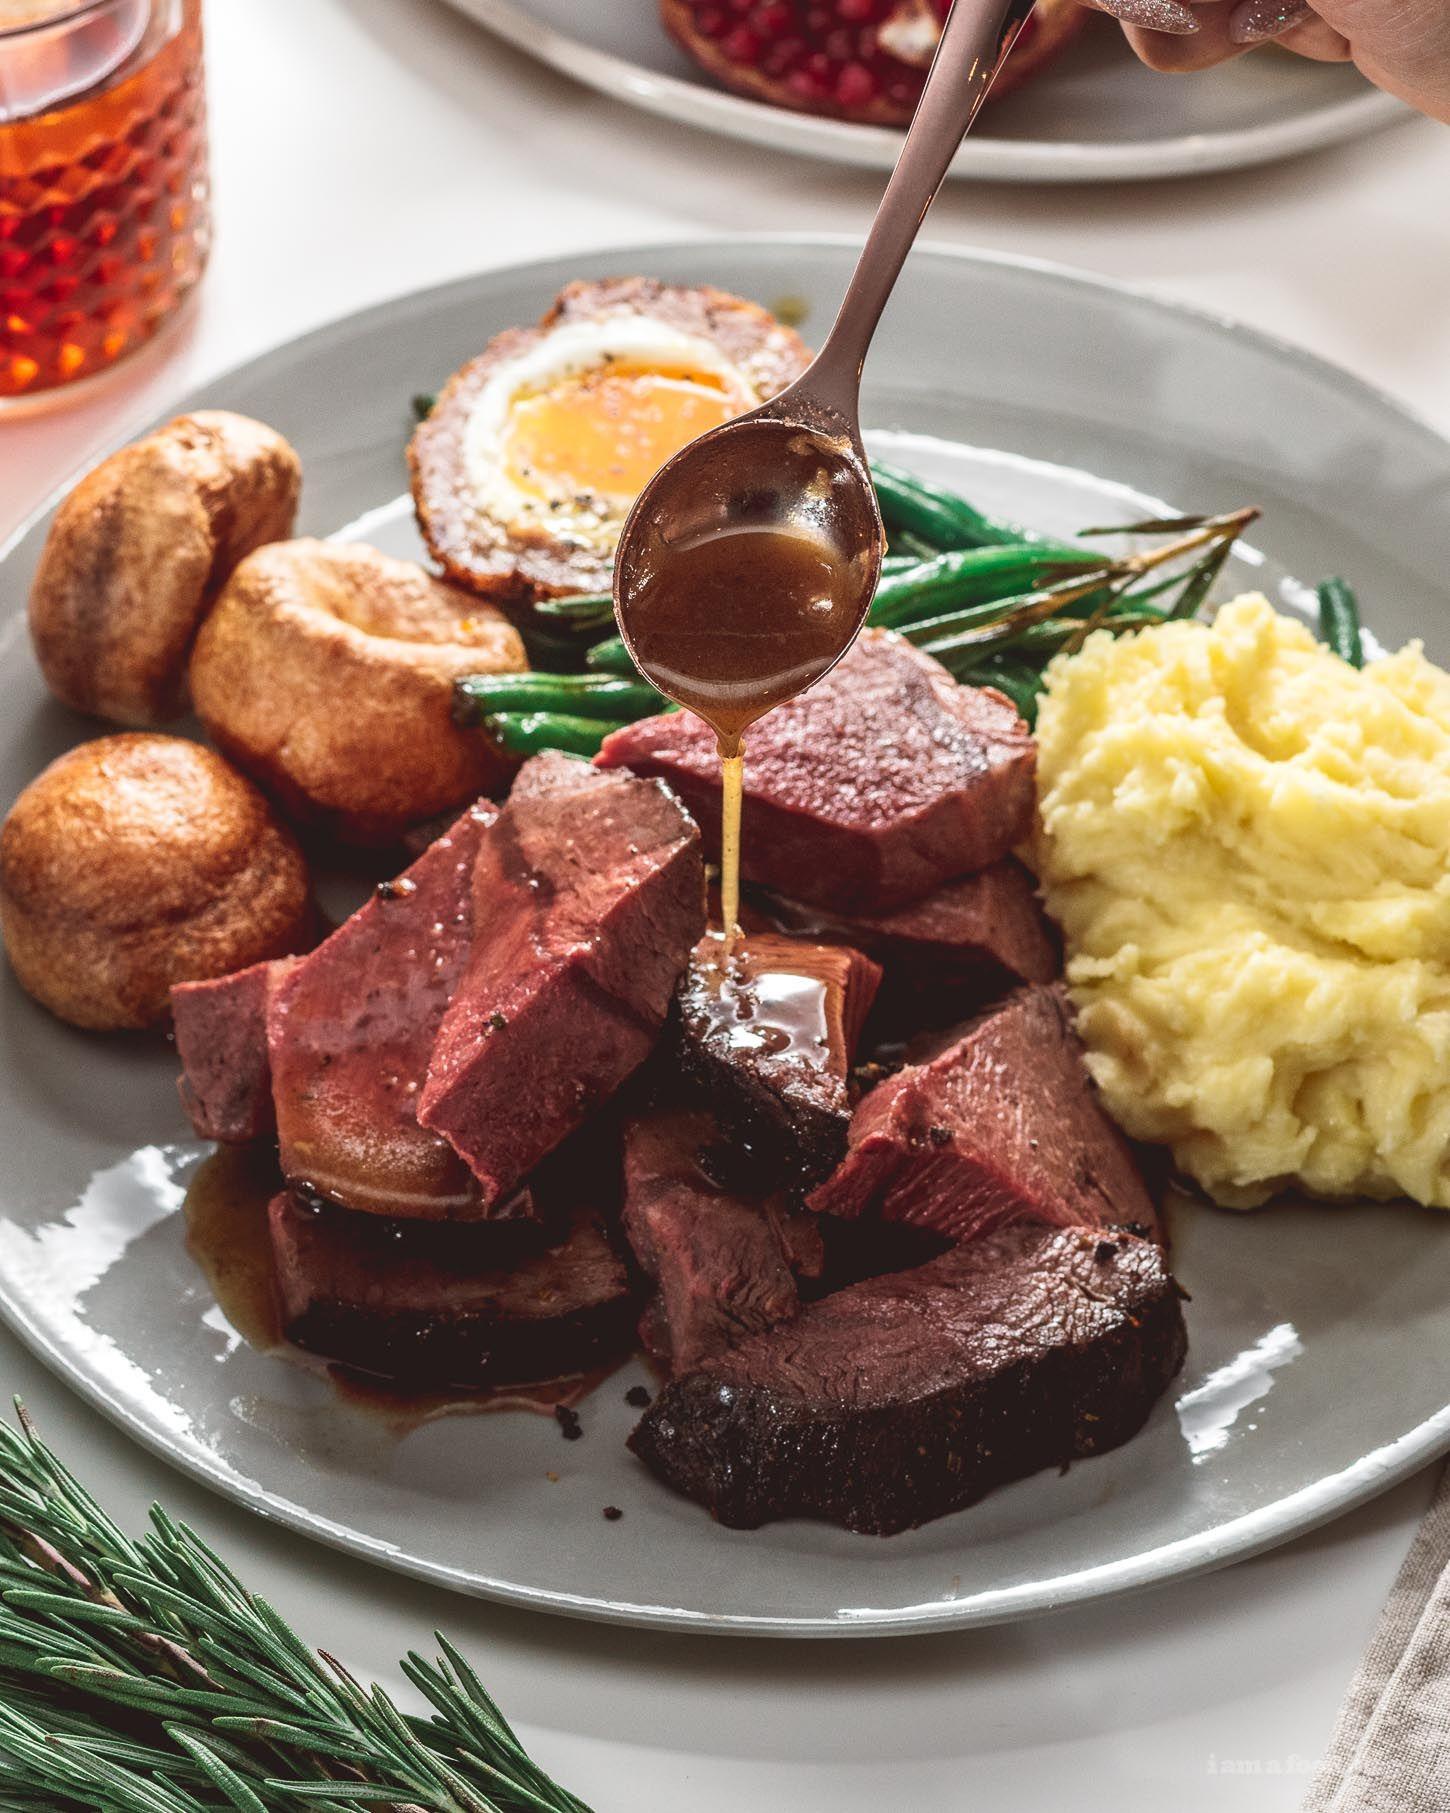 cfa74324741675c673696c41daf13038 - Ricette Roast Beef